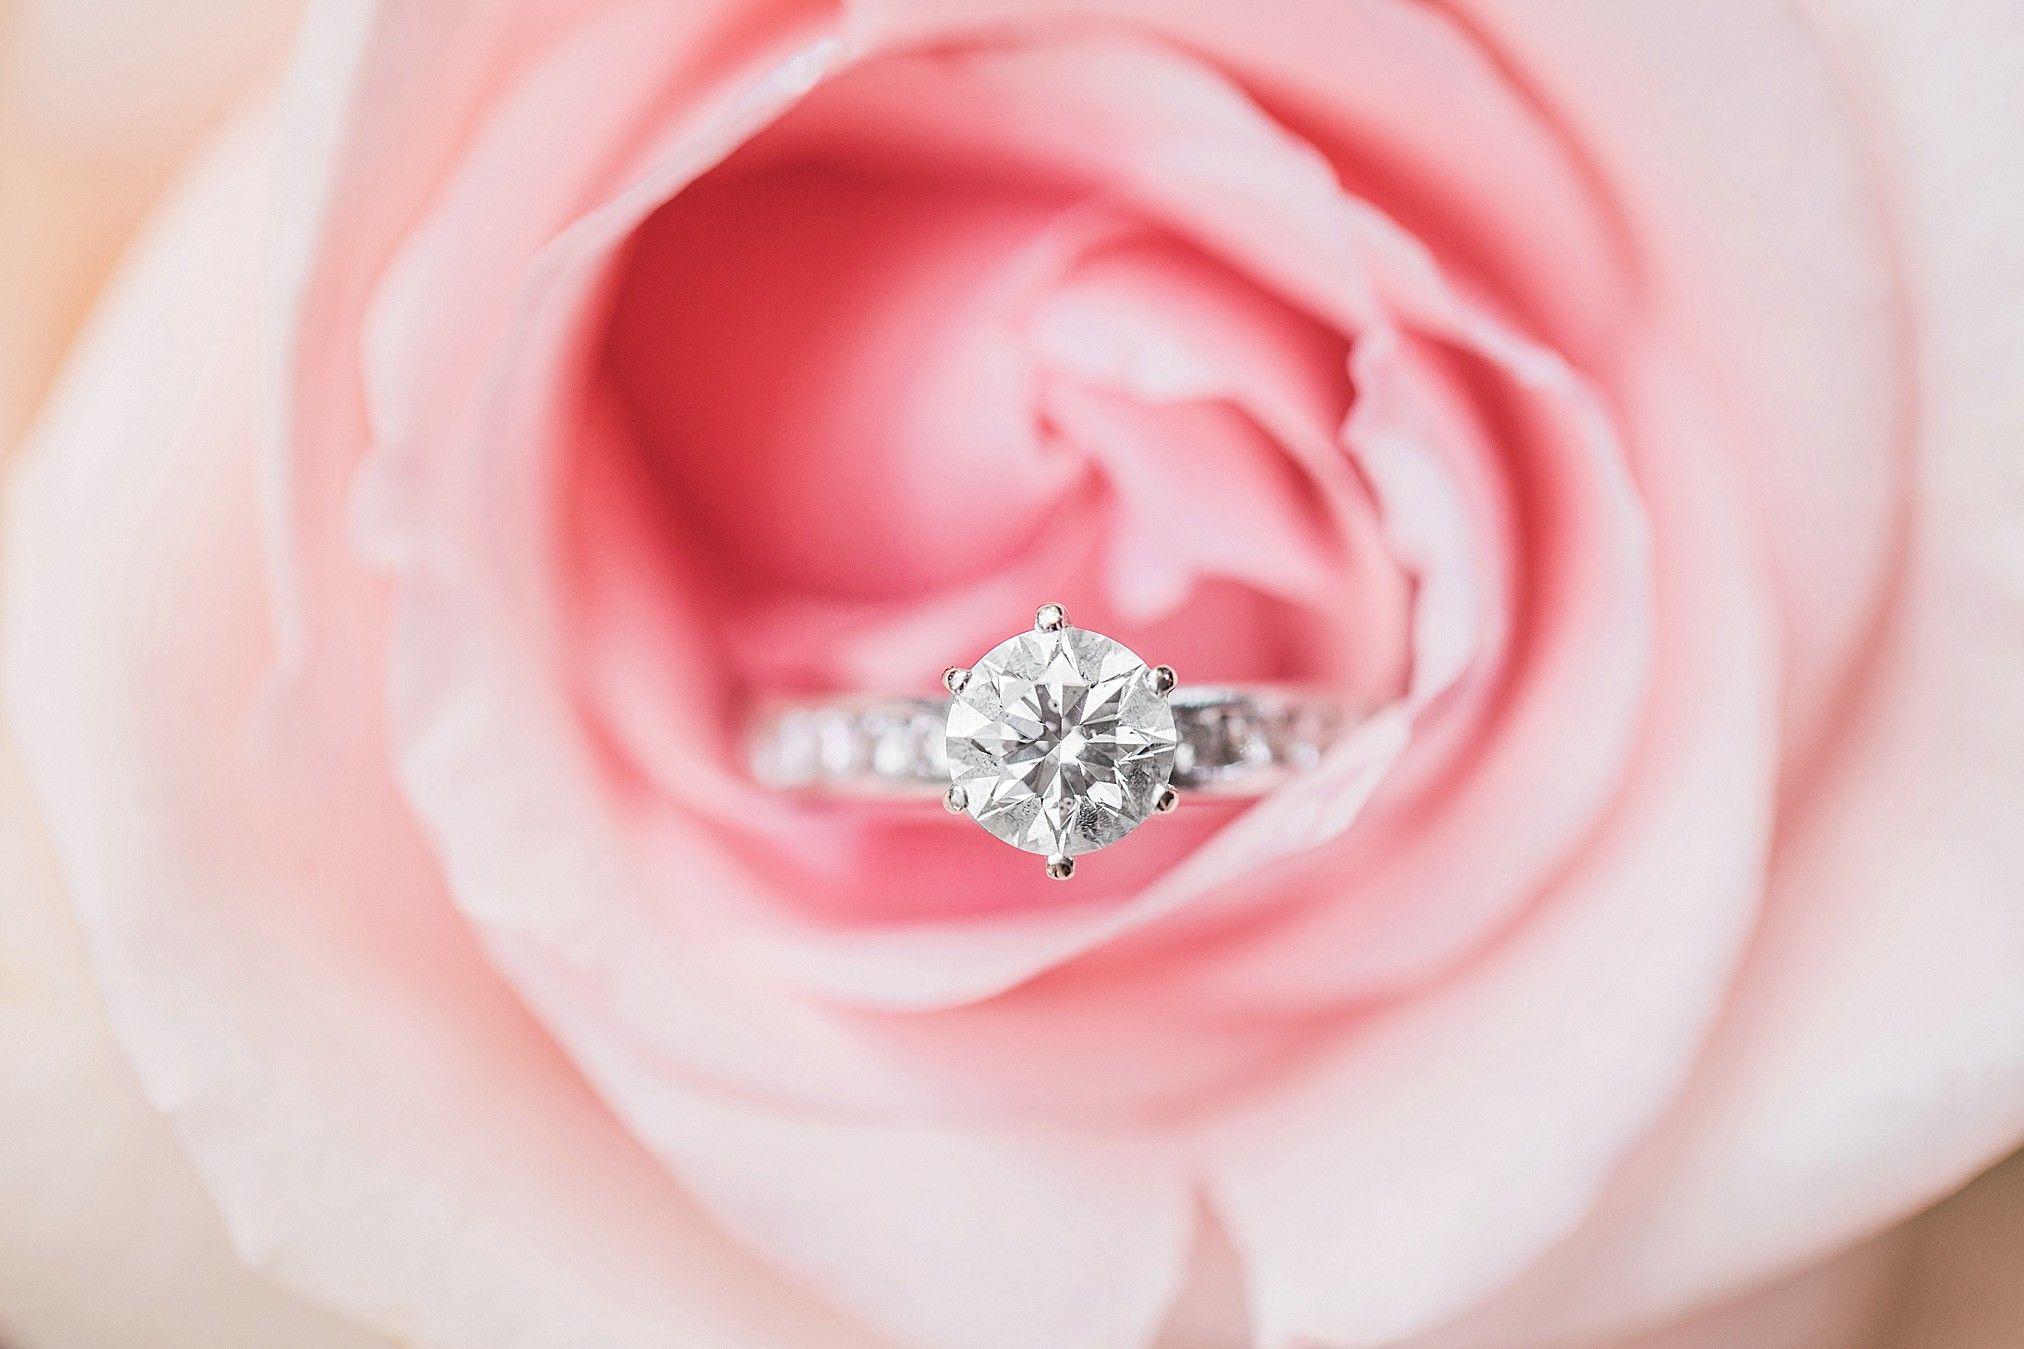 Engagement Ring, Diamond Ring, Wedding Ring, Photo by Dyanna LaMora ...